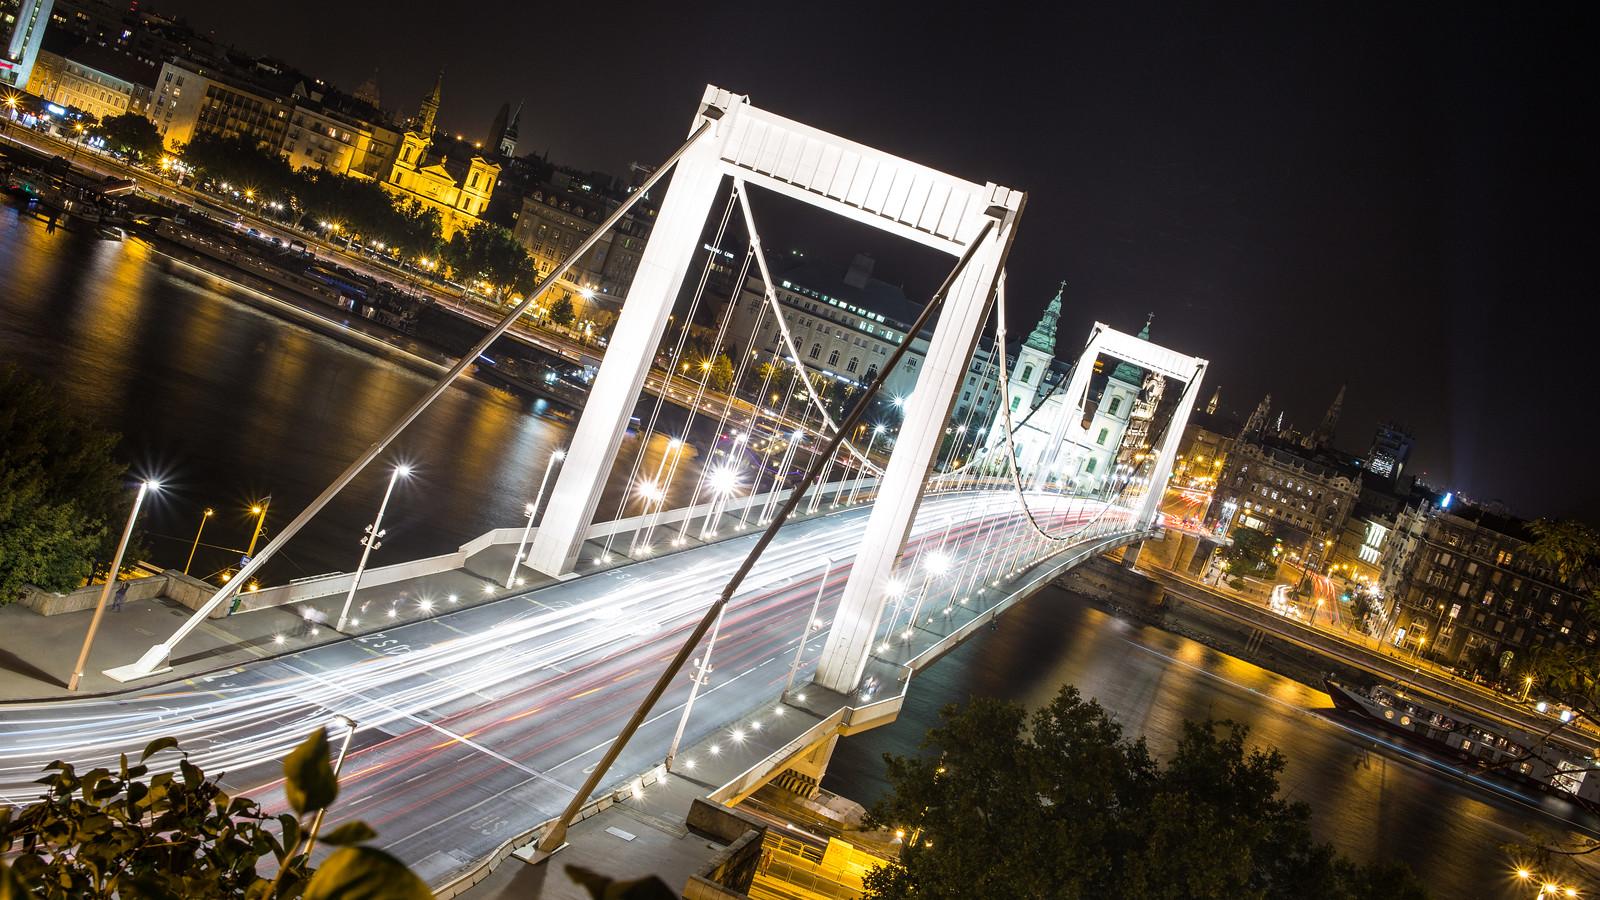 Elisabeth bridge in Budapest at night